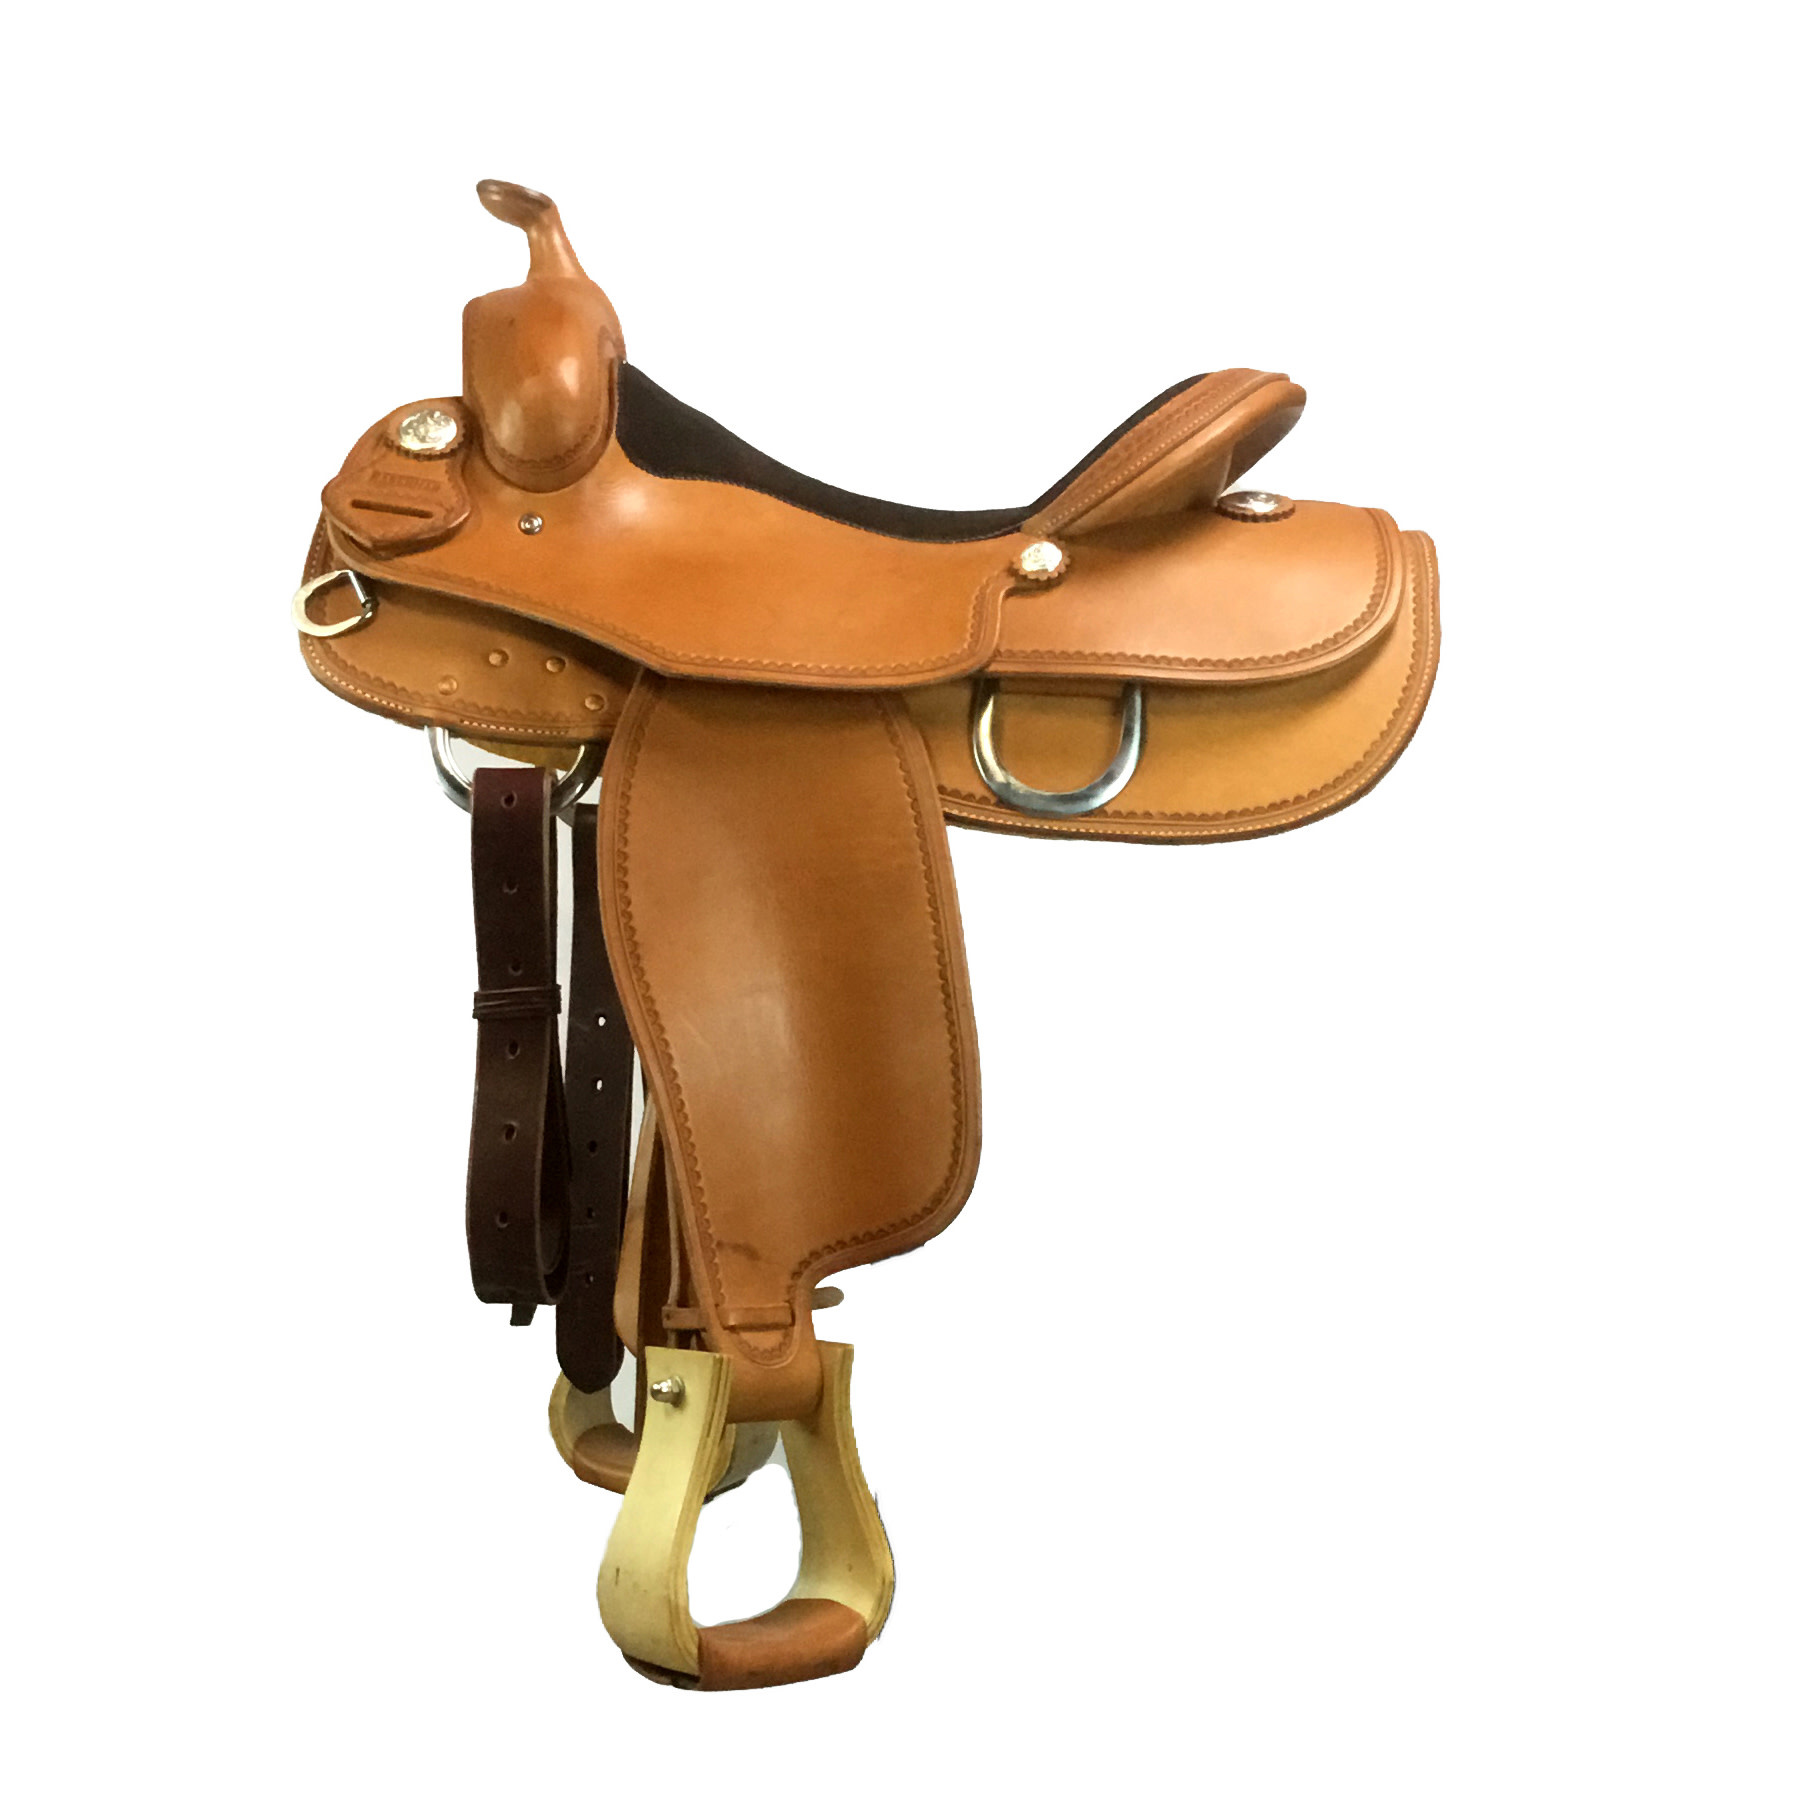 Ranchman Ranchman  example saddle 6